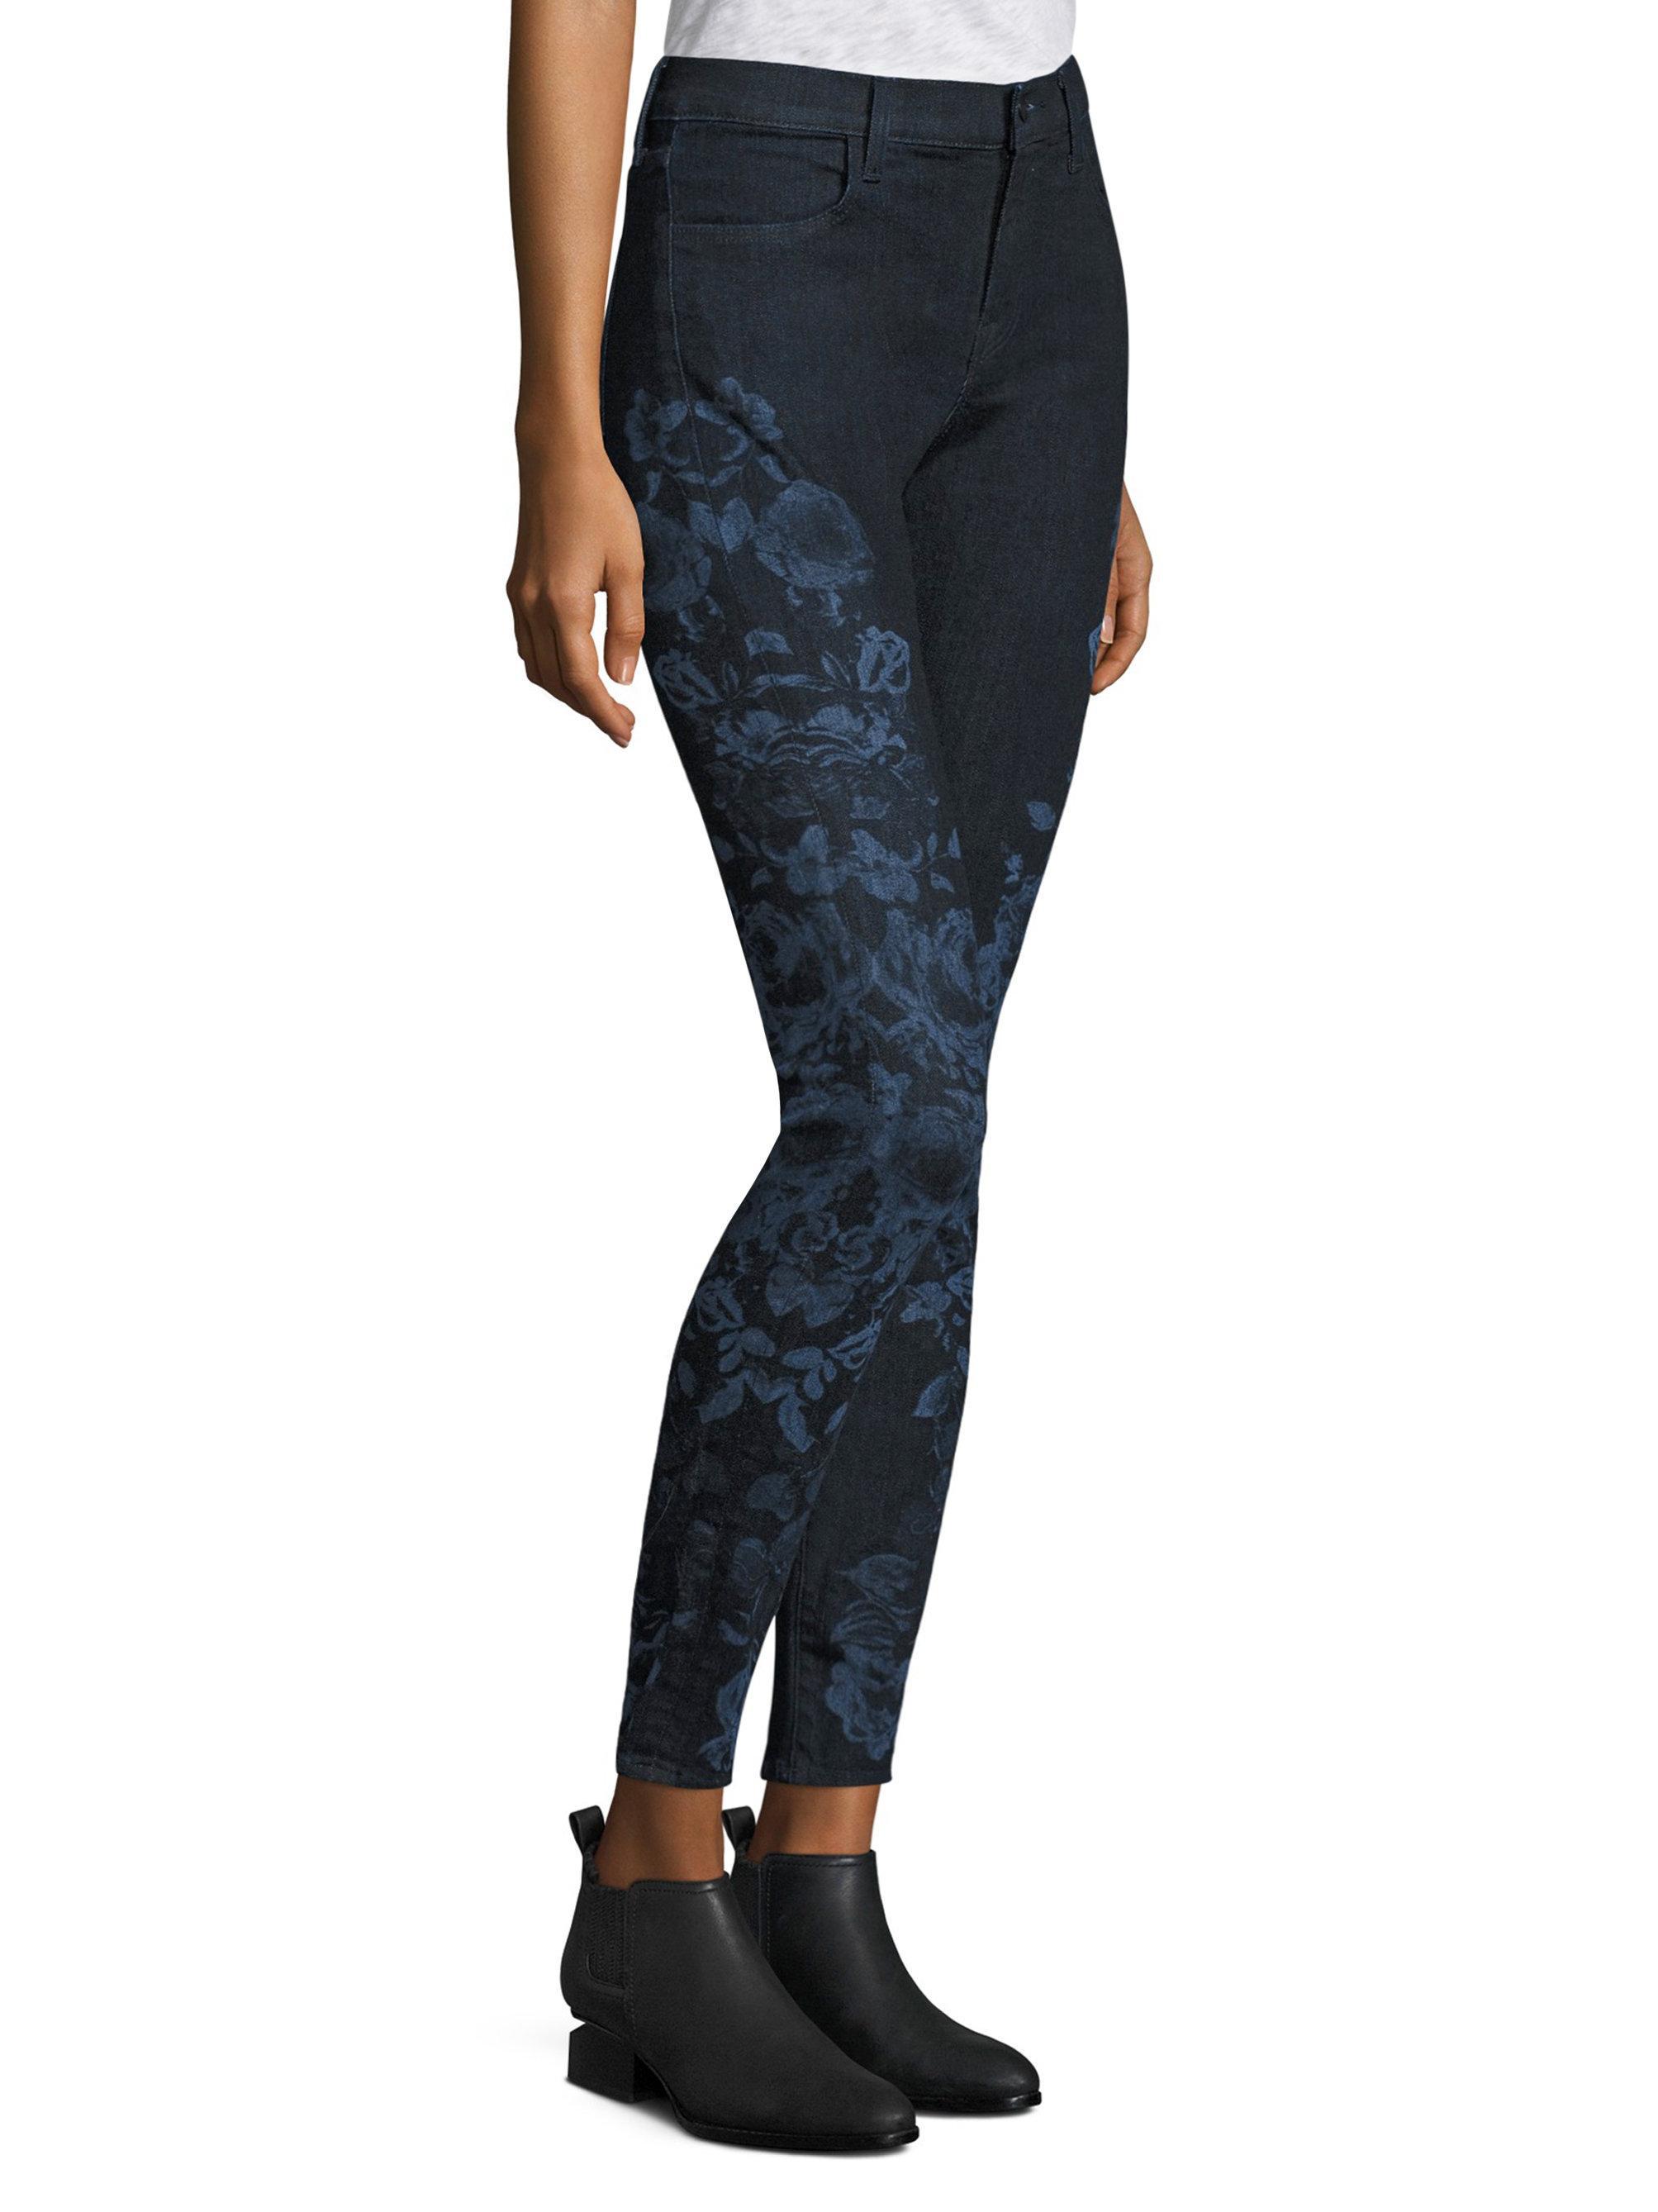 J brand floral skinny jeans